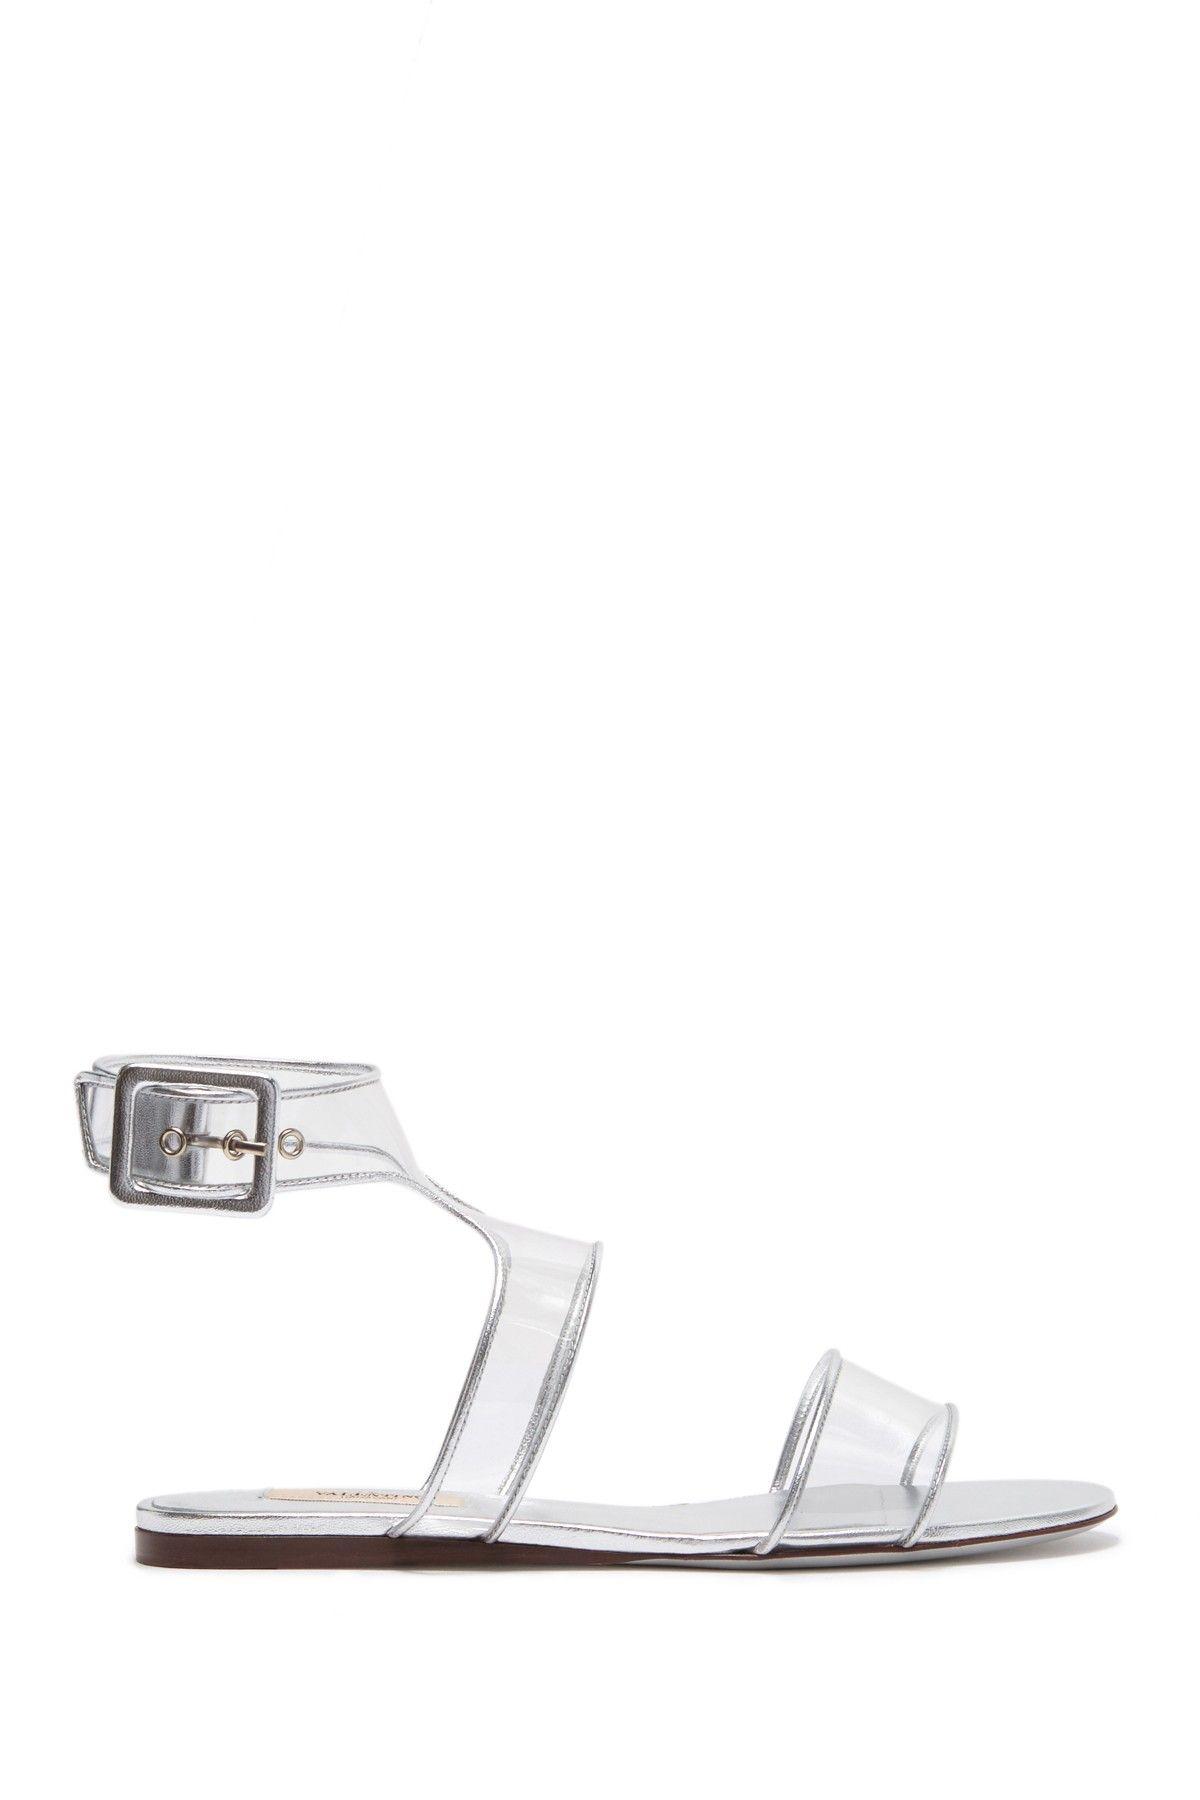 Valentino   Clear Sandal   Nordstrom